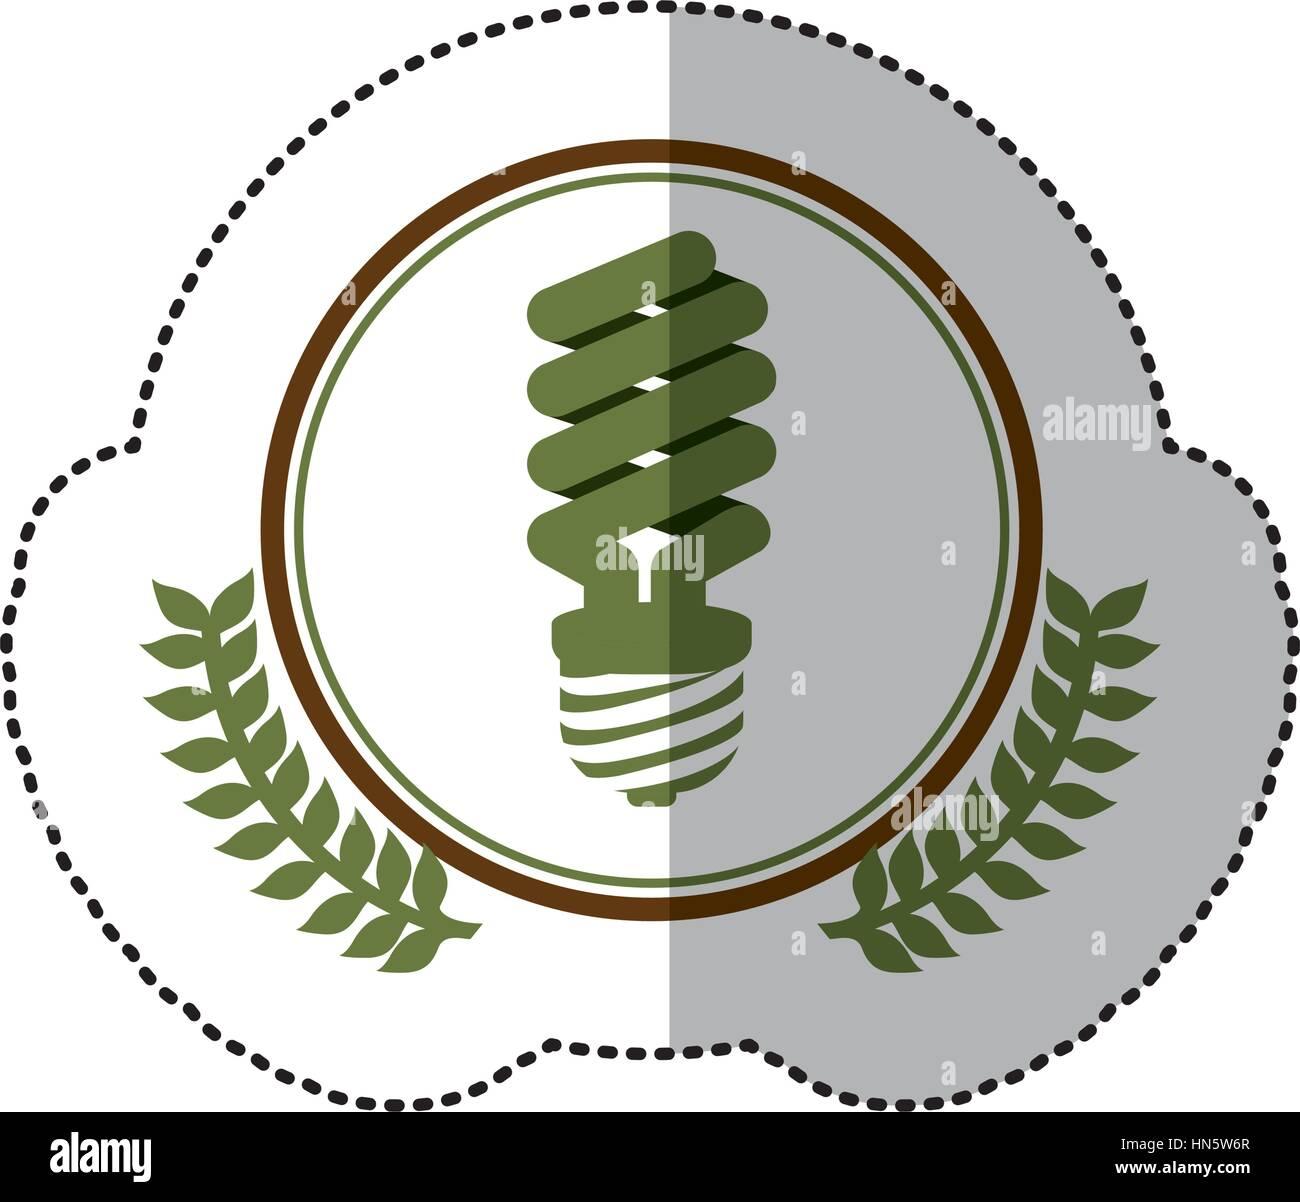 symbol bulb environmental care icon, vector illustration - Stock Image